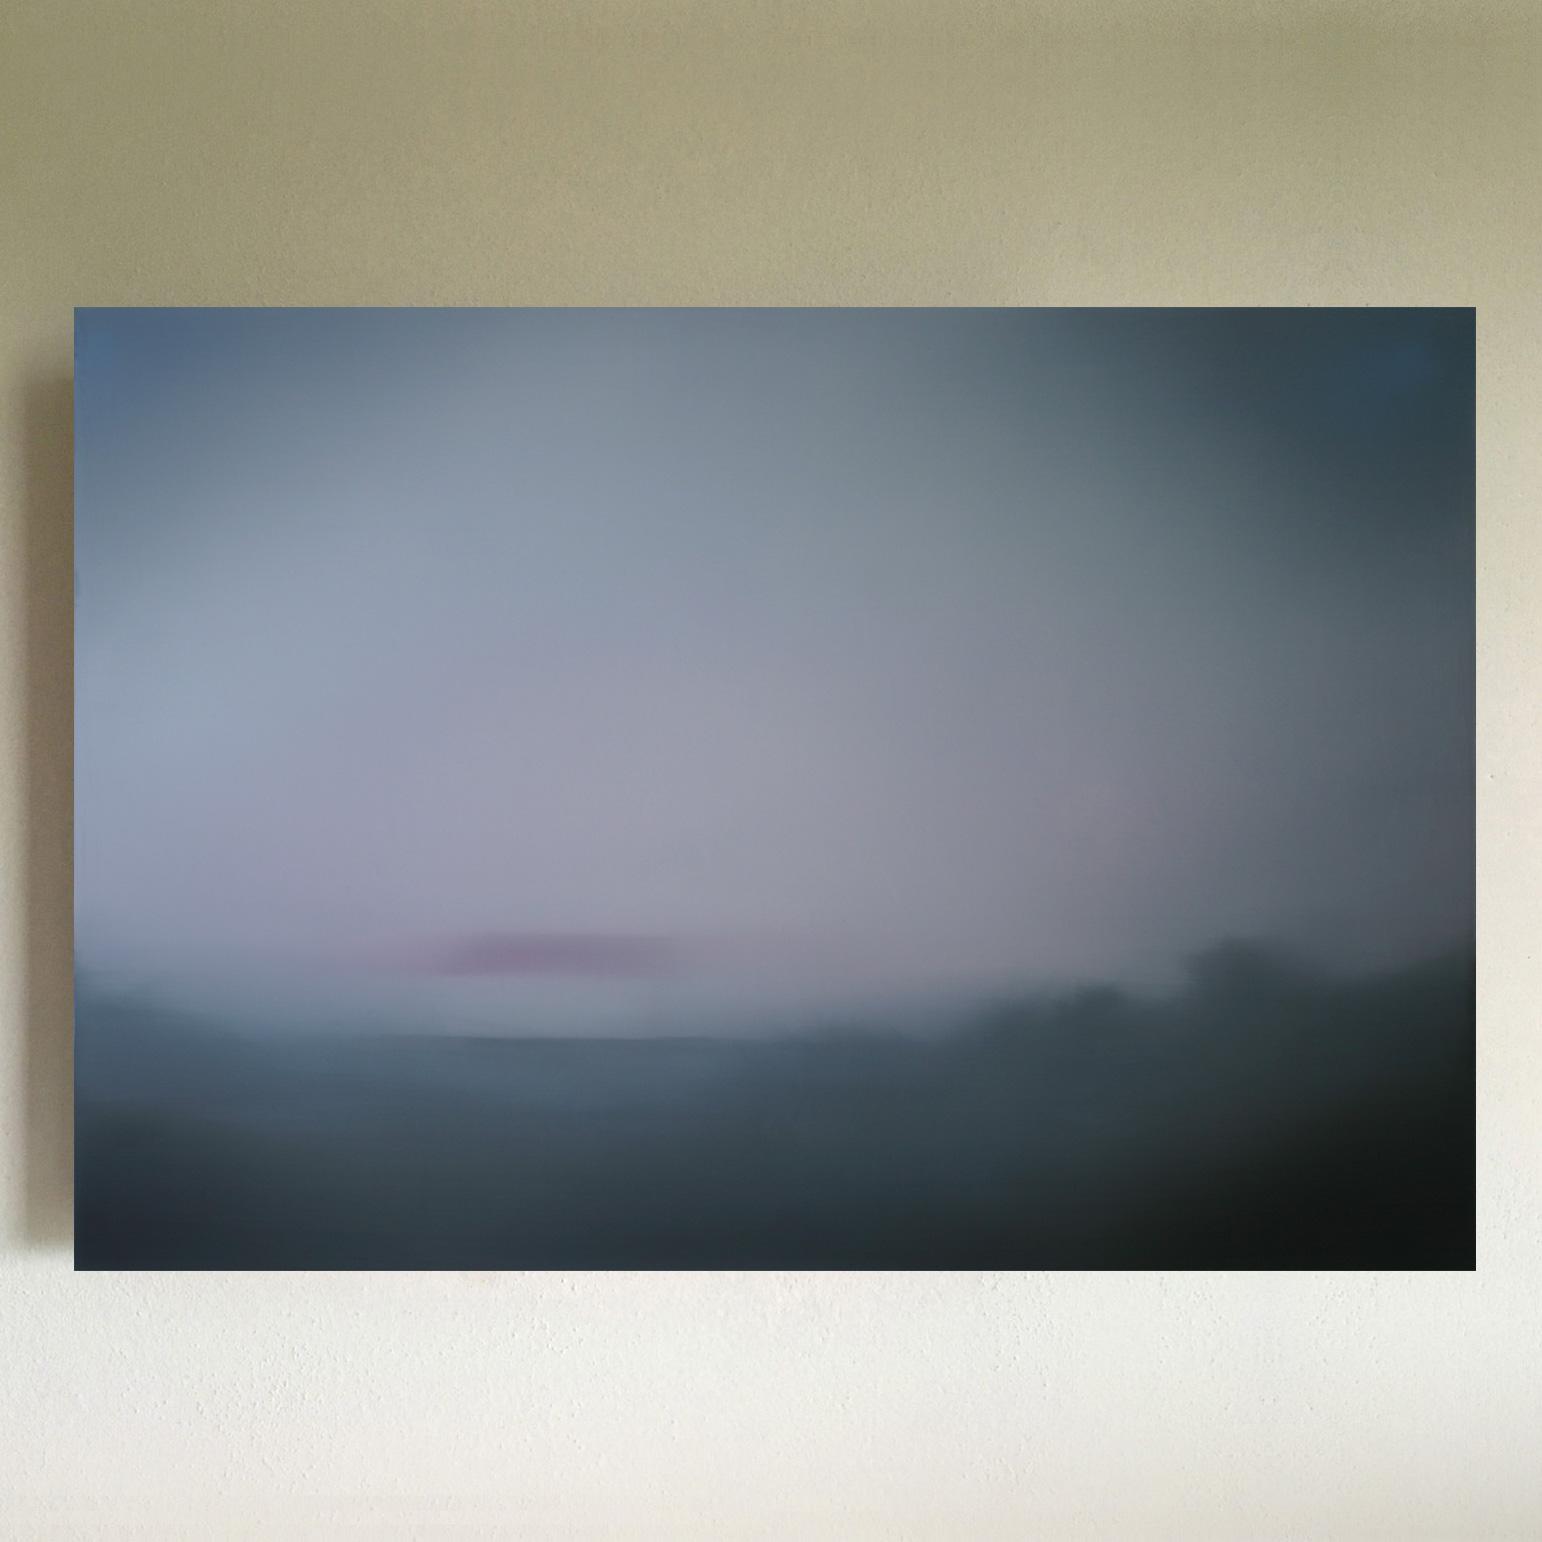 T#75-2011, oil on canvas, 100x140cm, priv. coll.